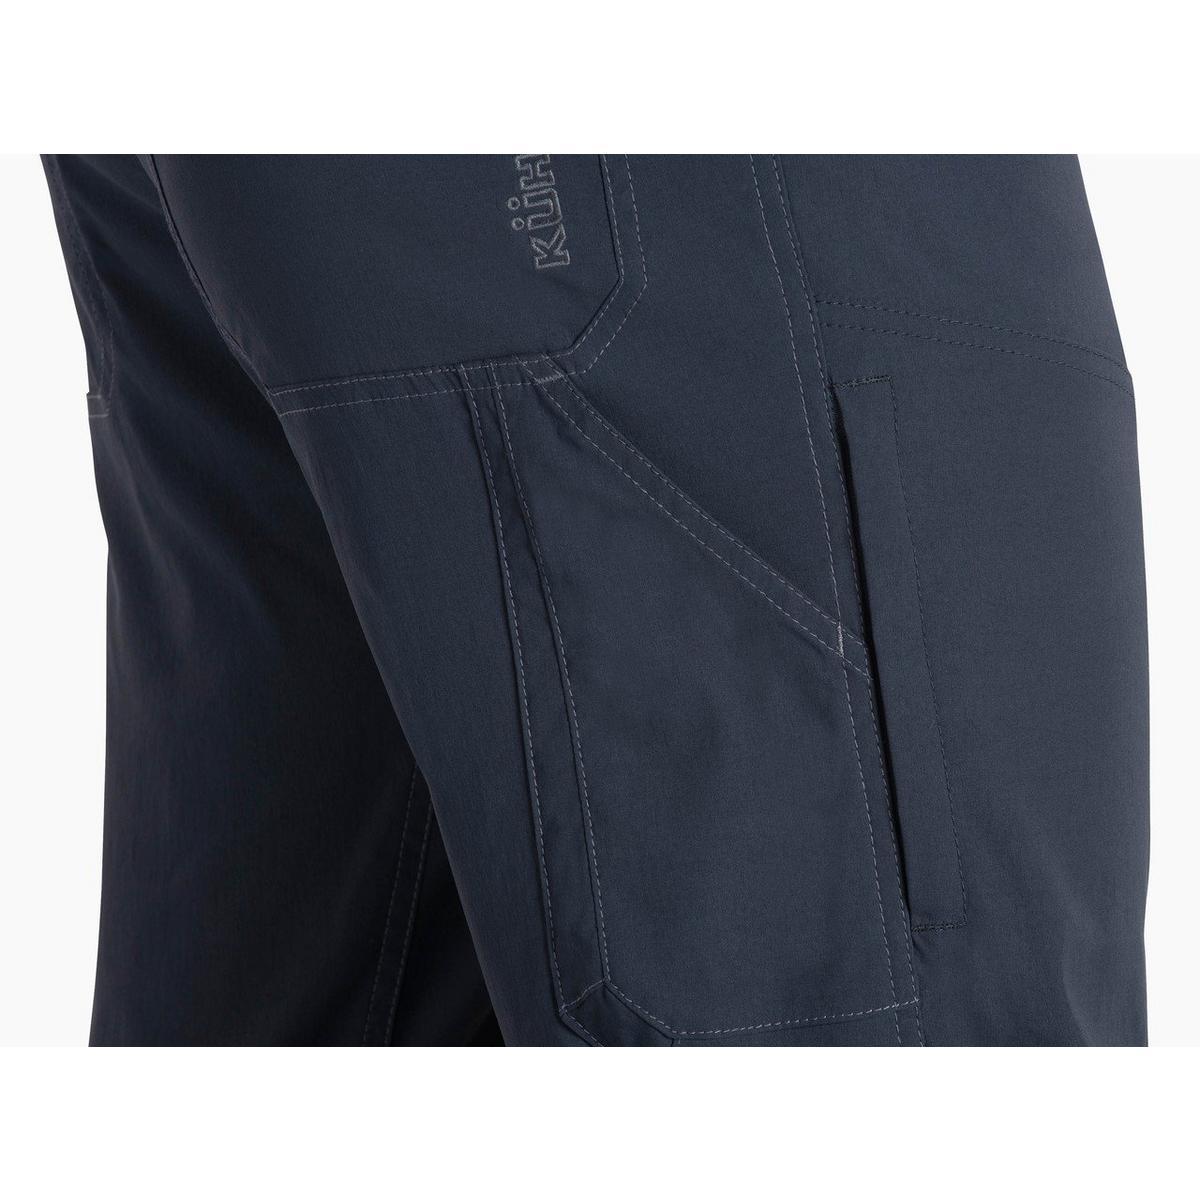 Kuhl Pant Men's Renegade LONG Leg Trousers Koal